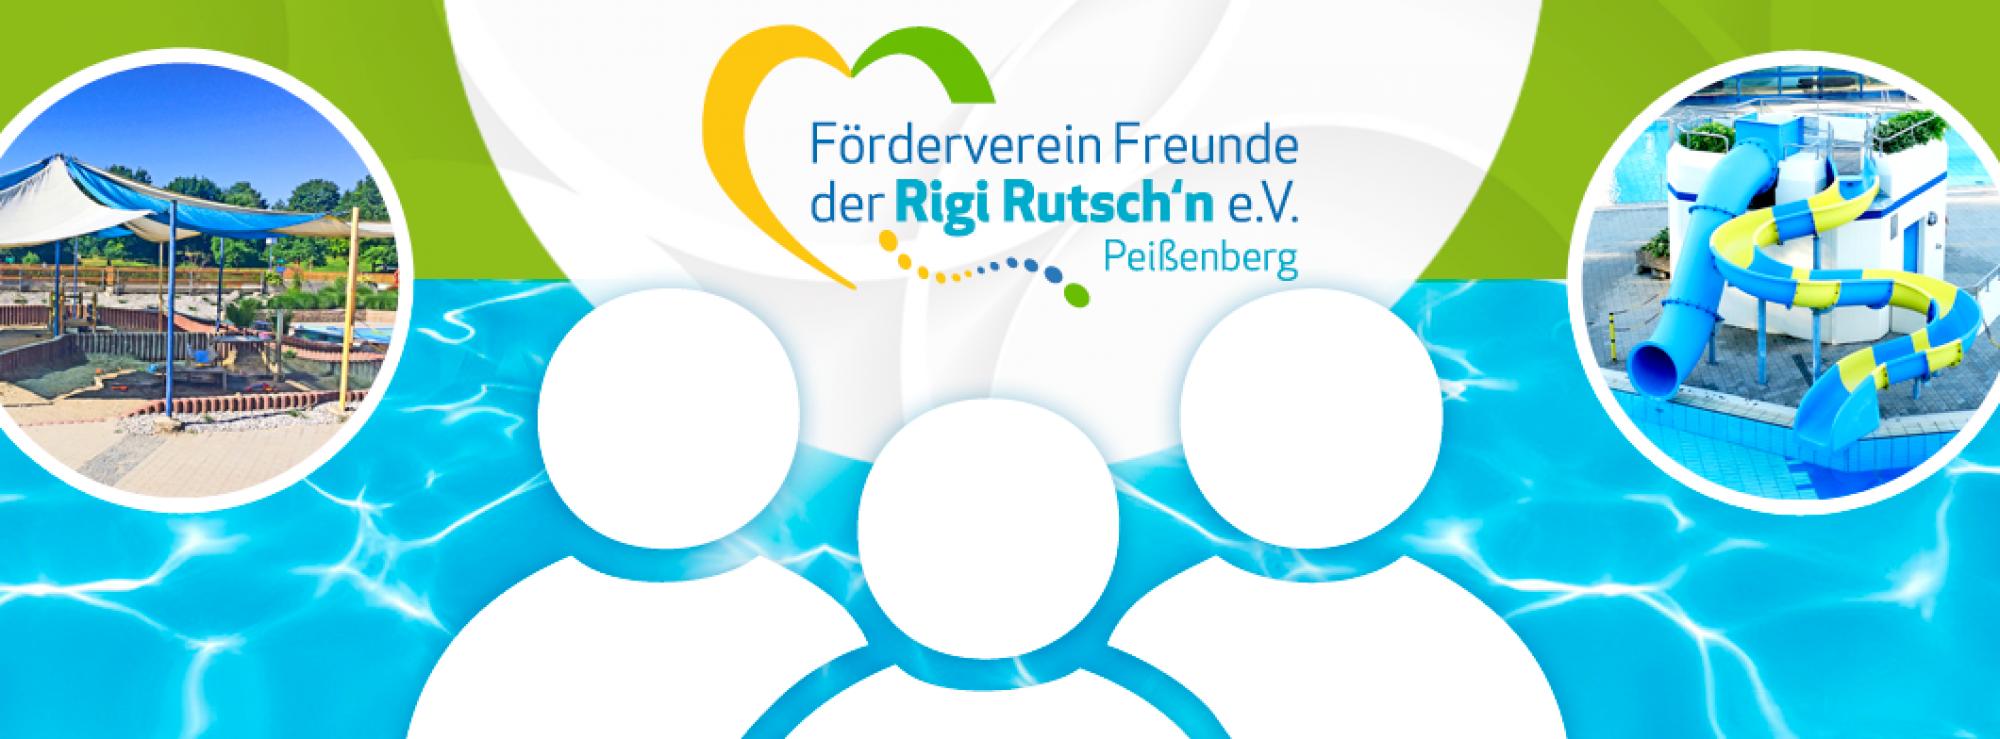 Förderverein Freunde der Rigi Rutsch'n e.V. Peißenberg